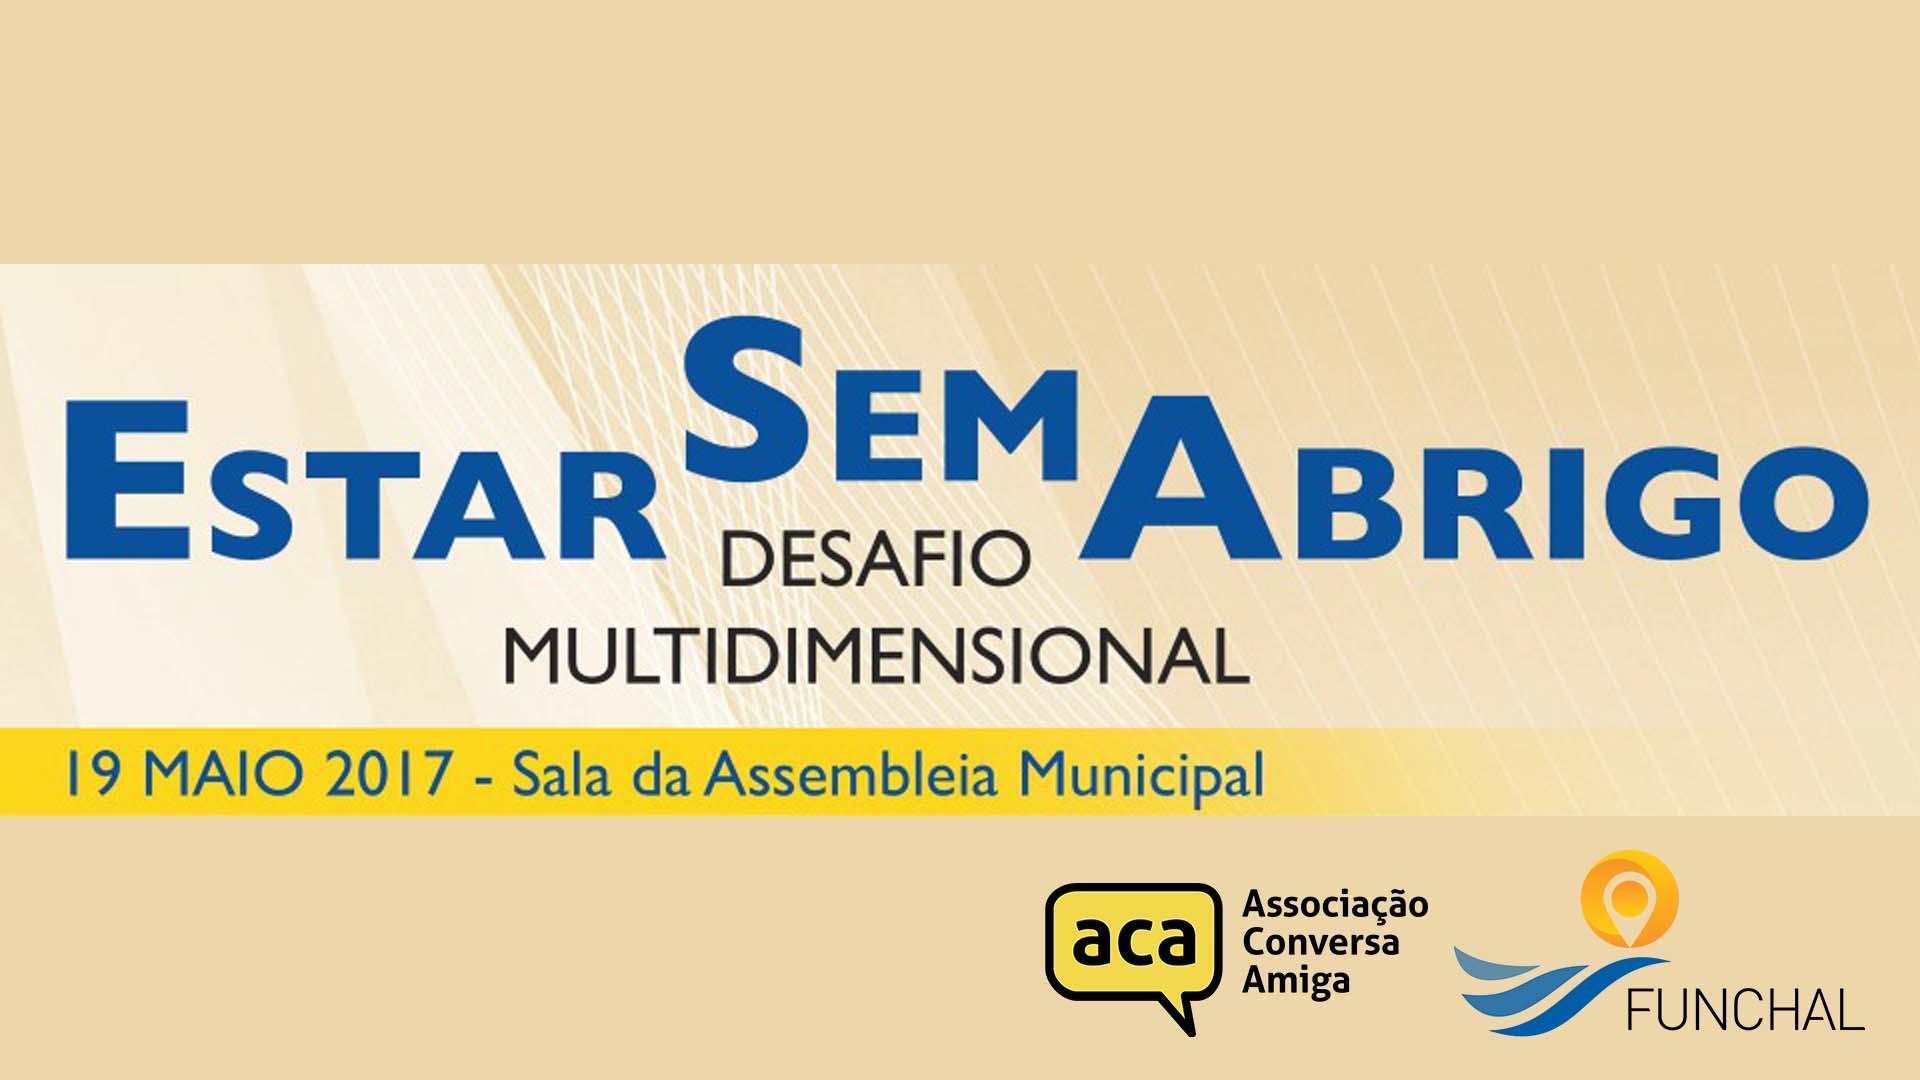 «ESTAR SEM ABRIGO – DESAFIO MULTIDIMENSIONAL» / Funchal – 19 de Maio de 2017